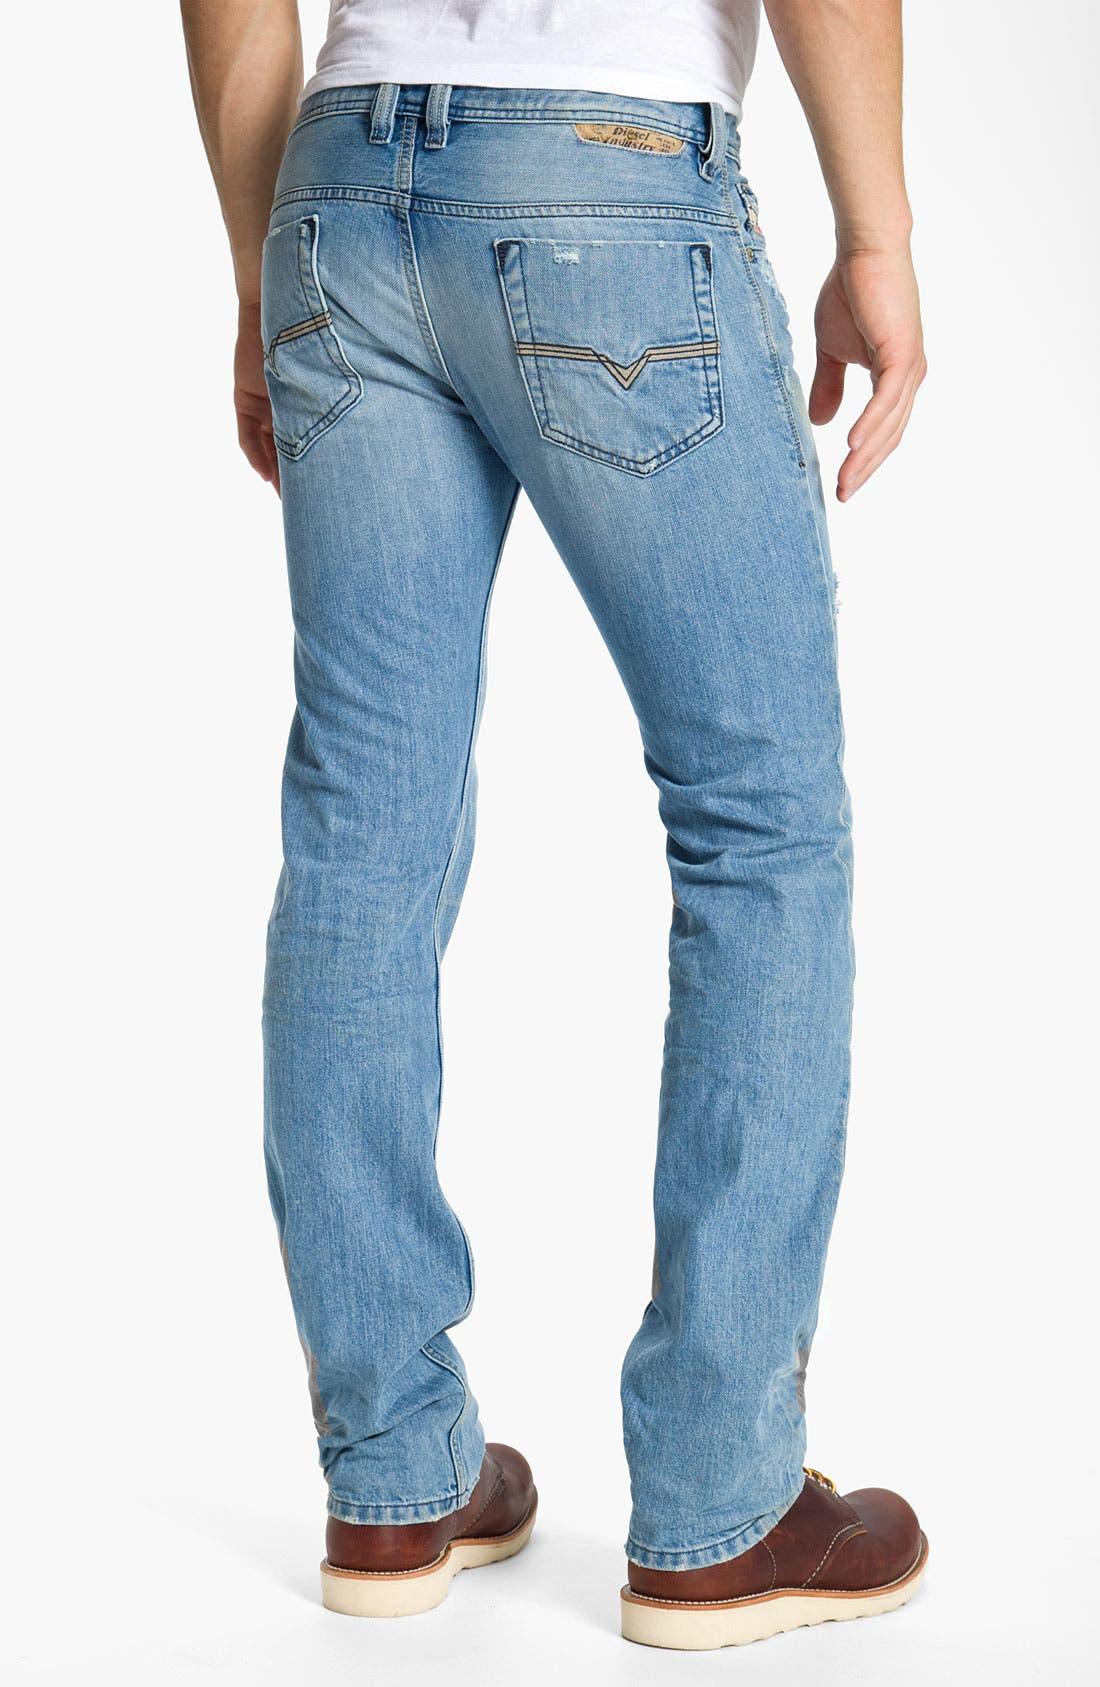 Alternate Image 1 Selected - DIESEL® 'Safado' Straight Leg Jeans (0802I)